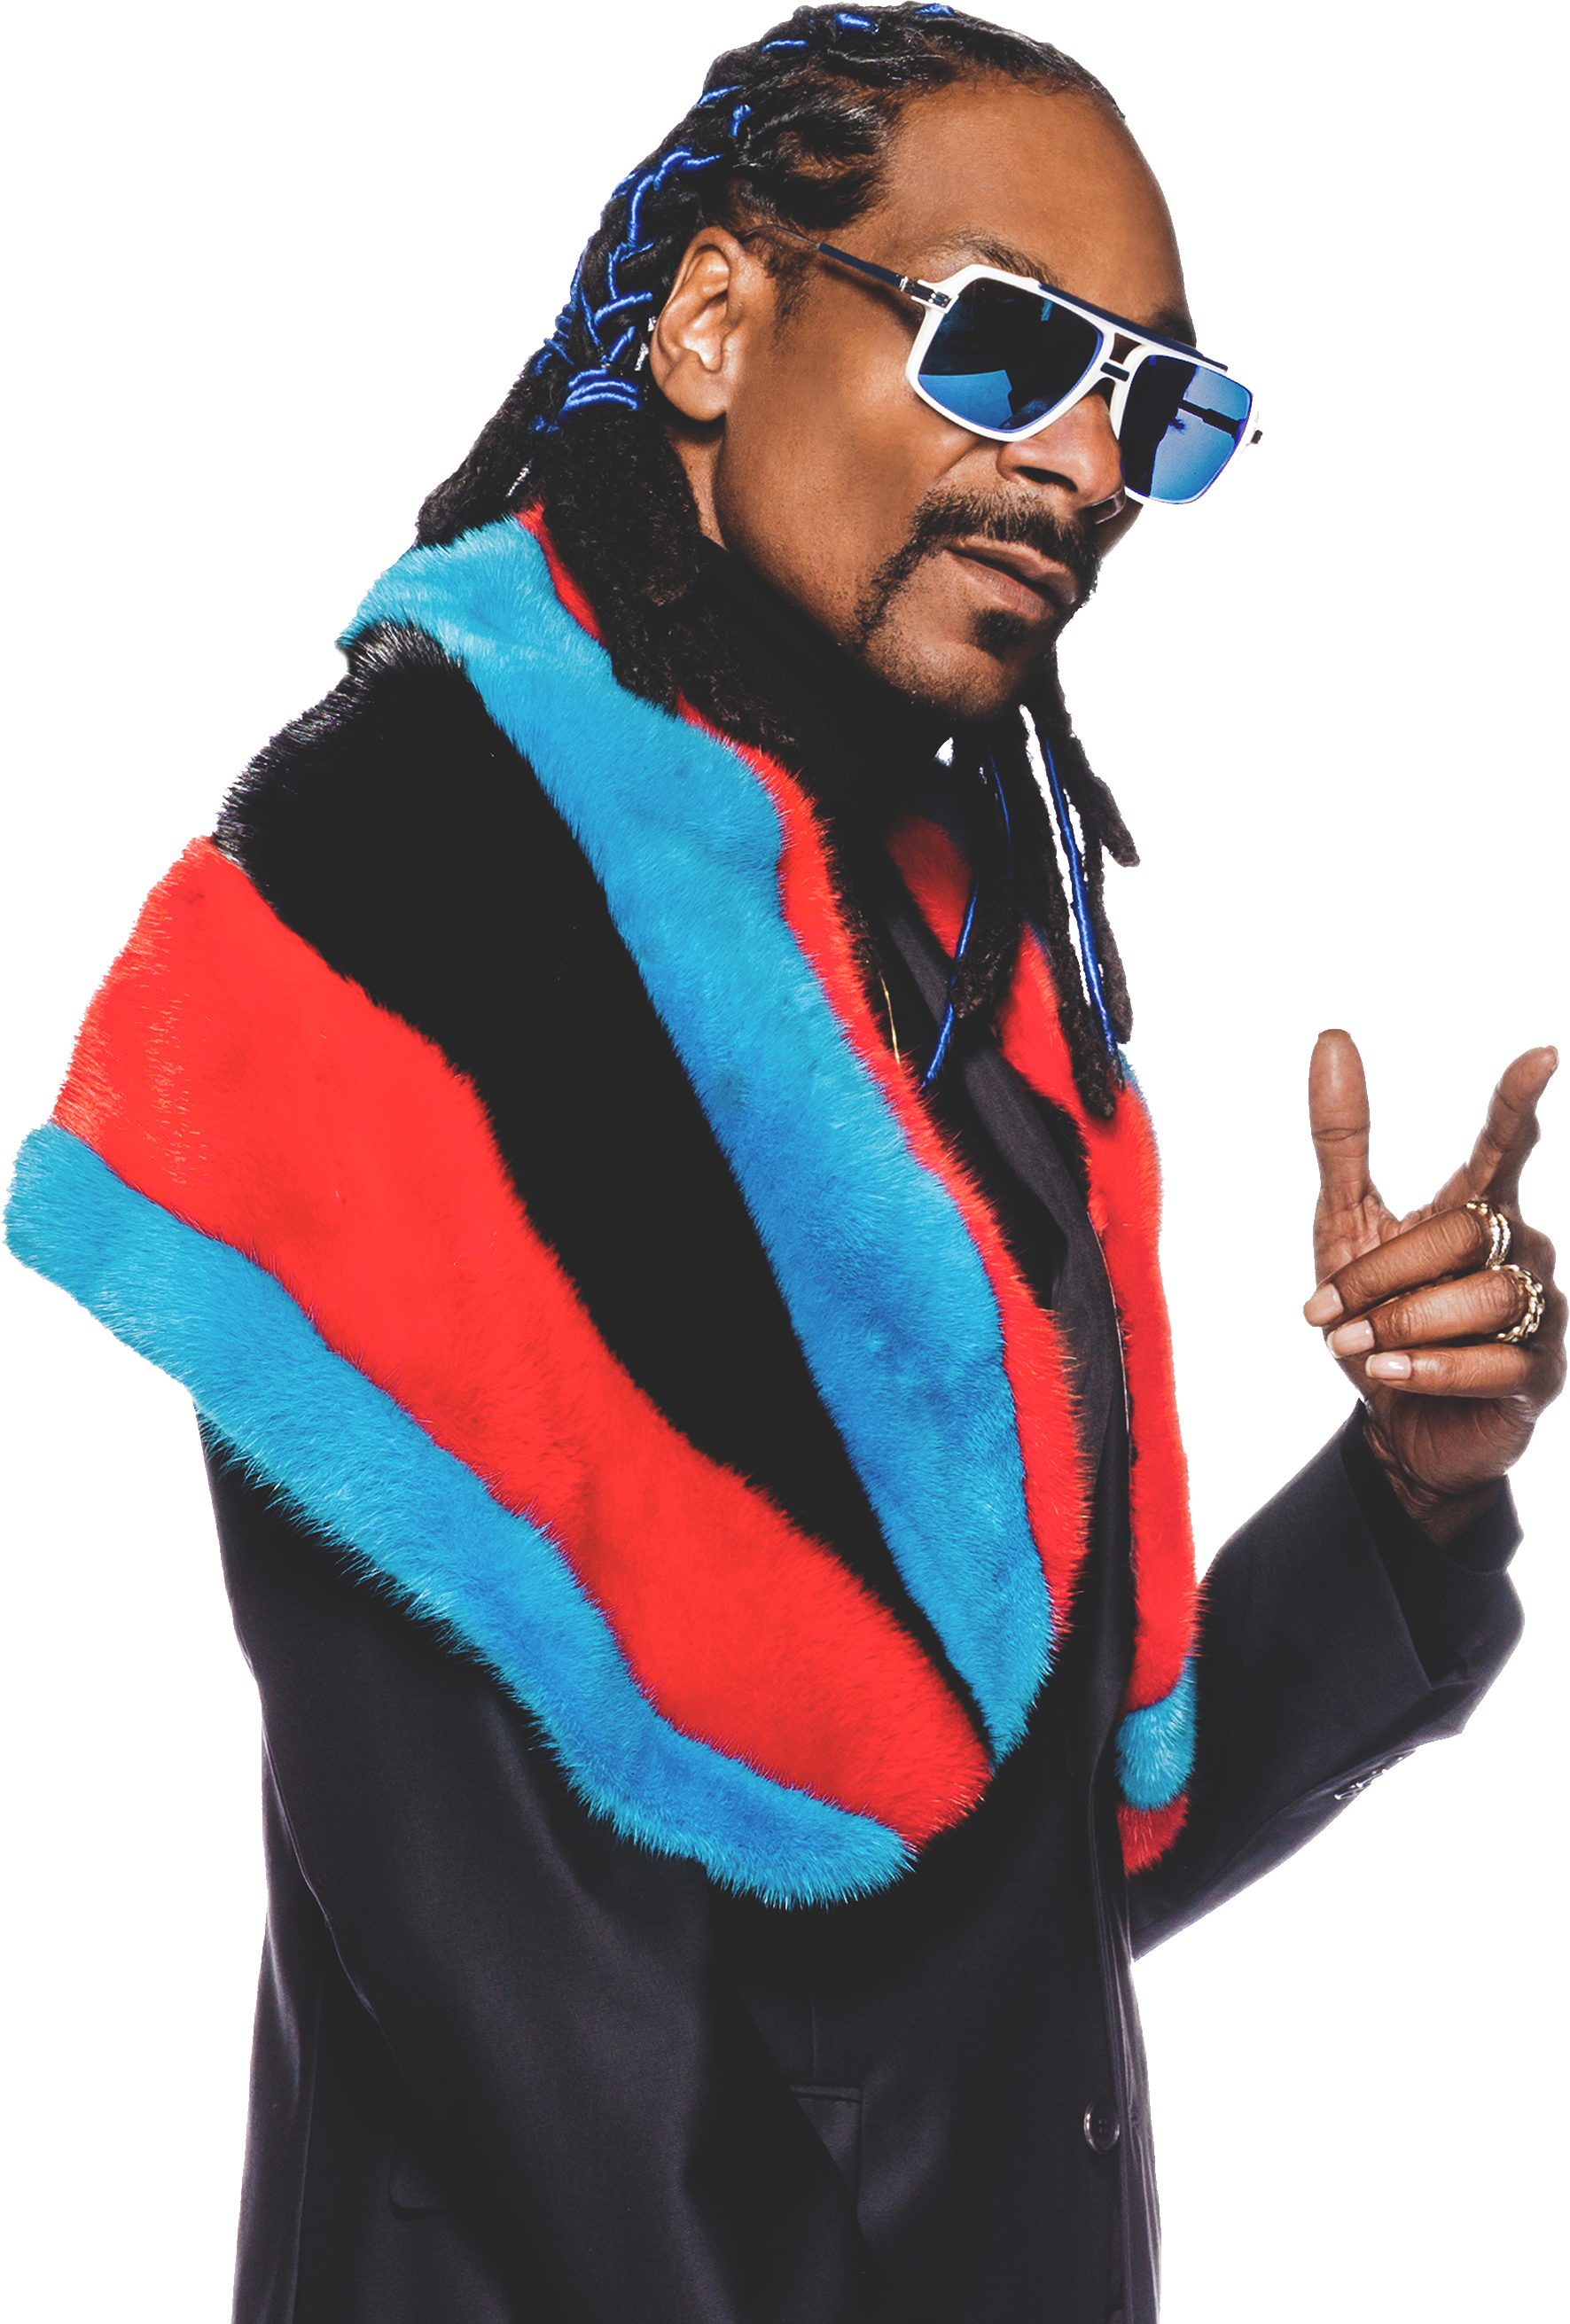 Snoop Dogg Png Image Snoop Dogg Dogg Lovebox Festival